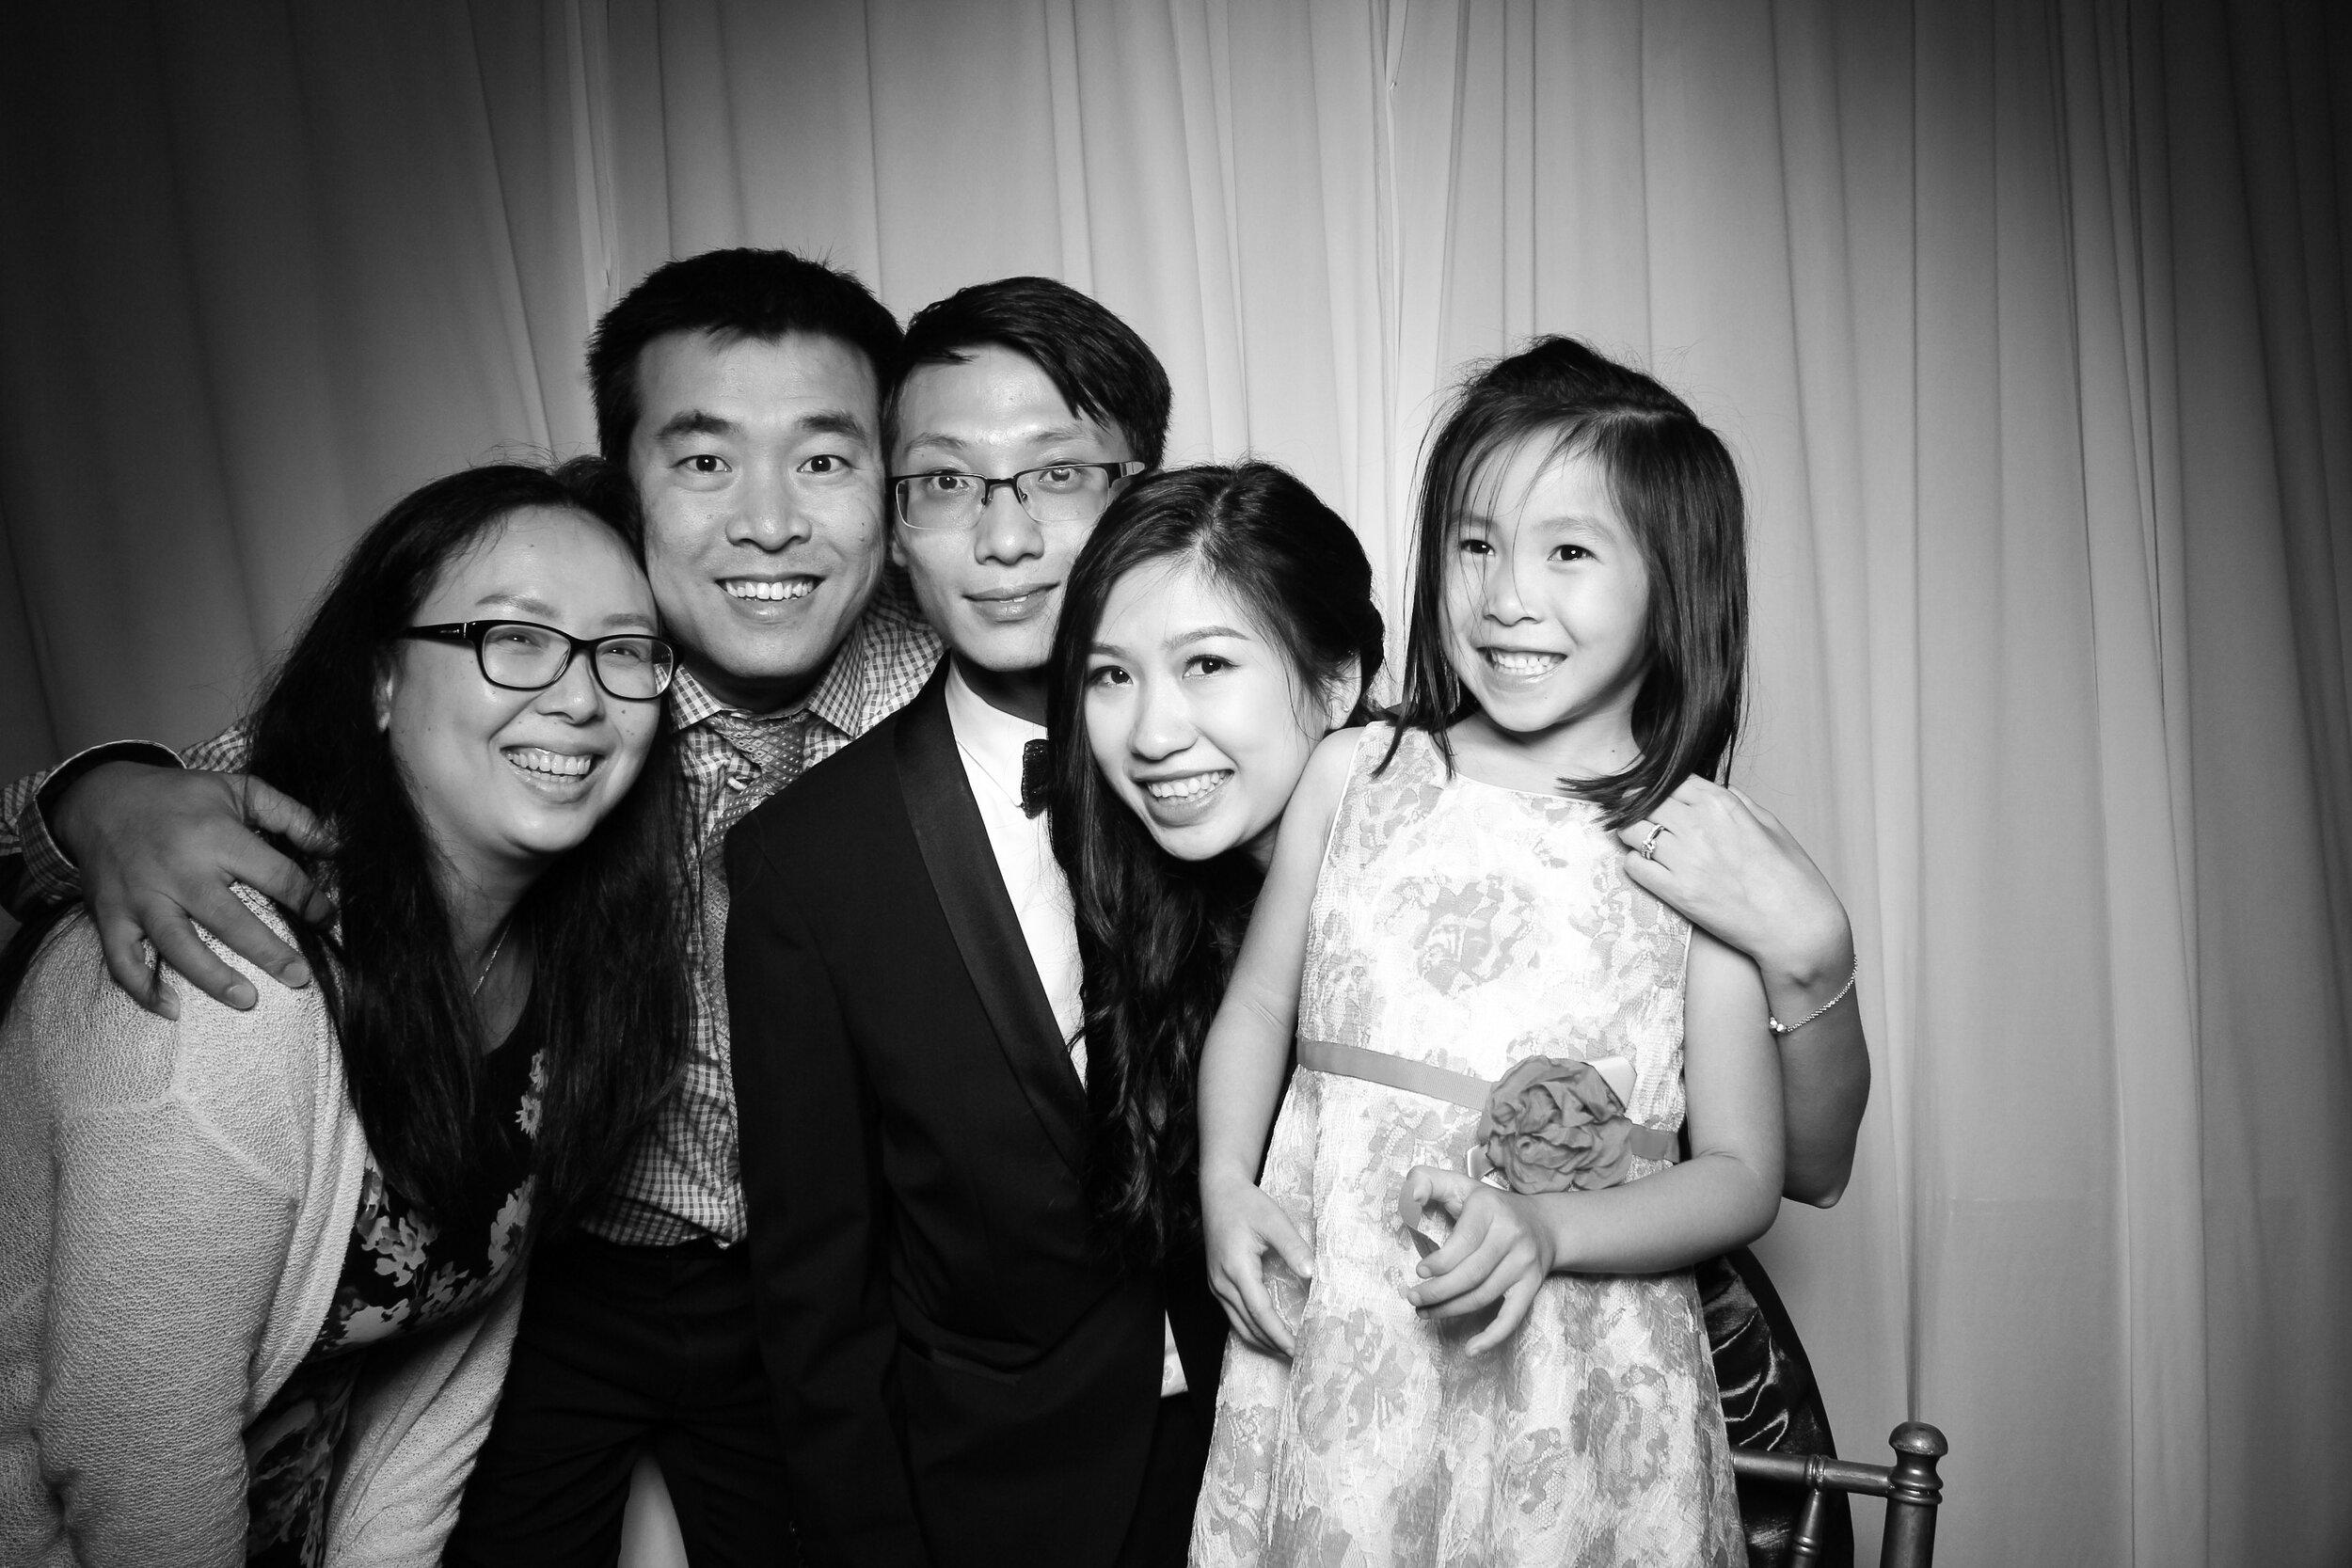 Cai_Restaurant_Chinatown_Chicago_Wedding_Photo_Booth_23.jpg